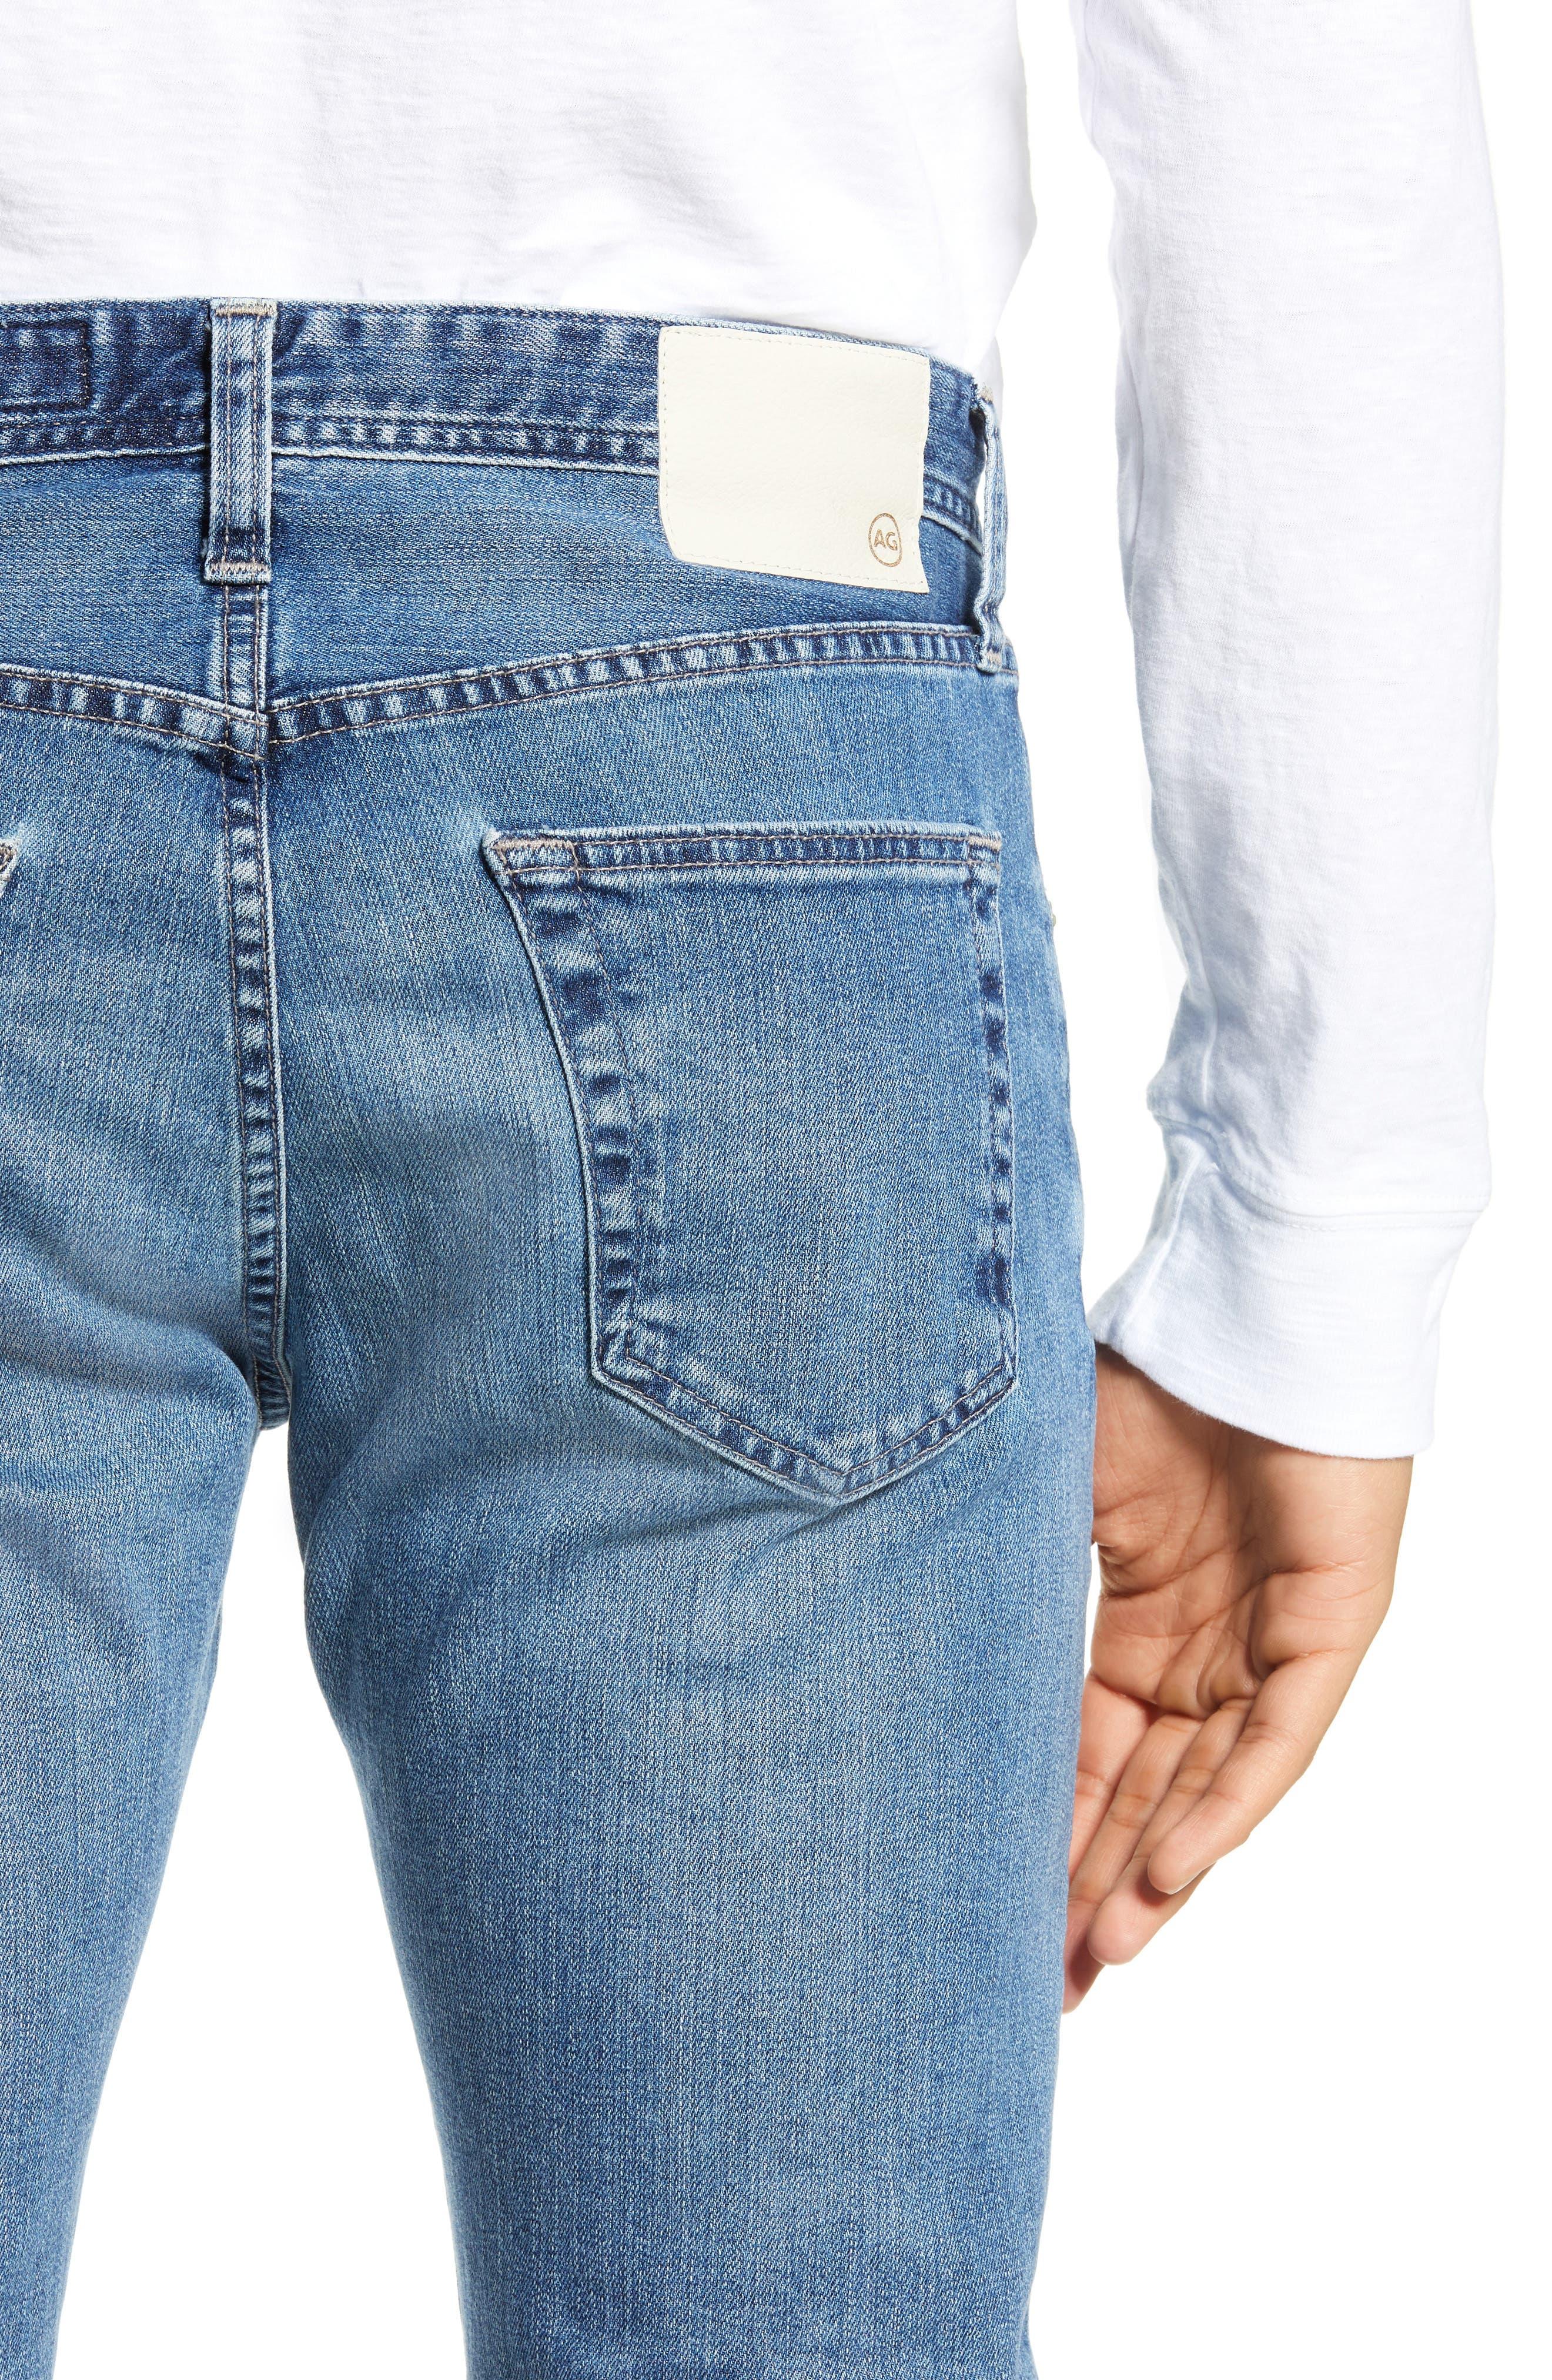 Tellis Slim Fit Jeans,                             Alternate thumbnail 4, color,                             16 YEARS EAVES